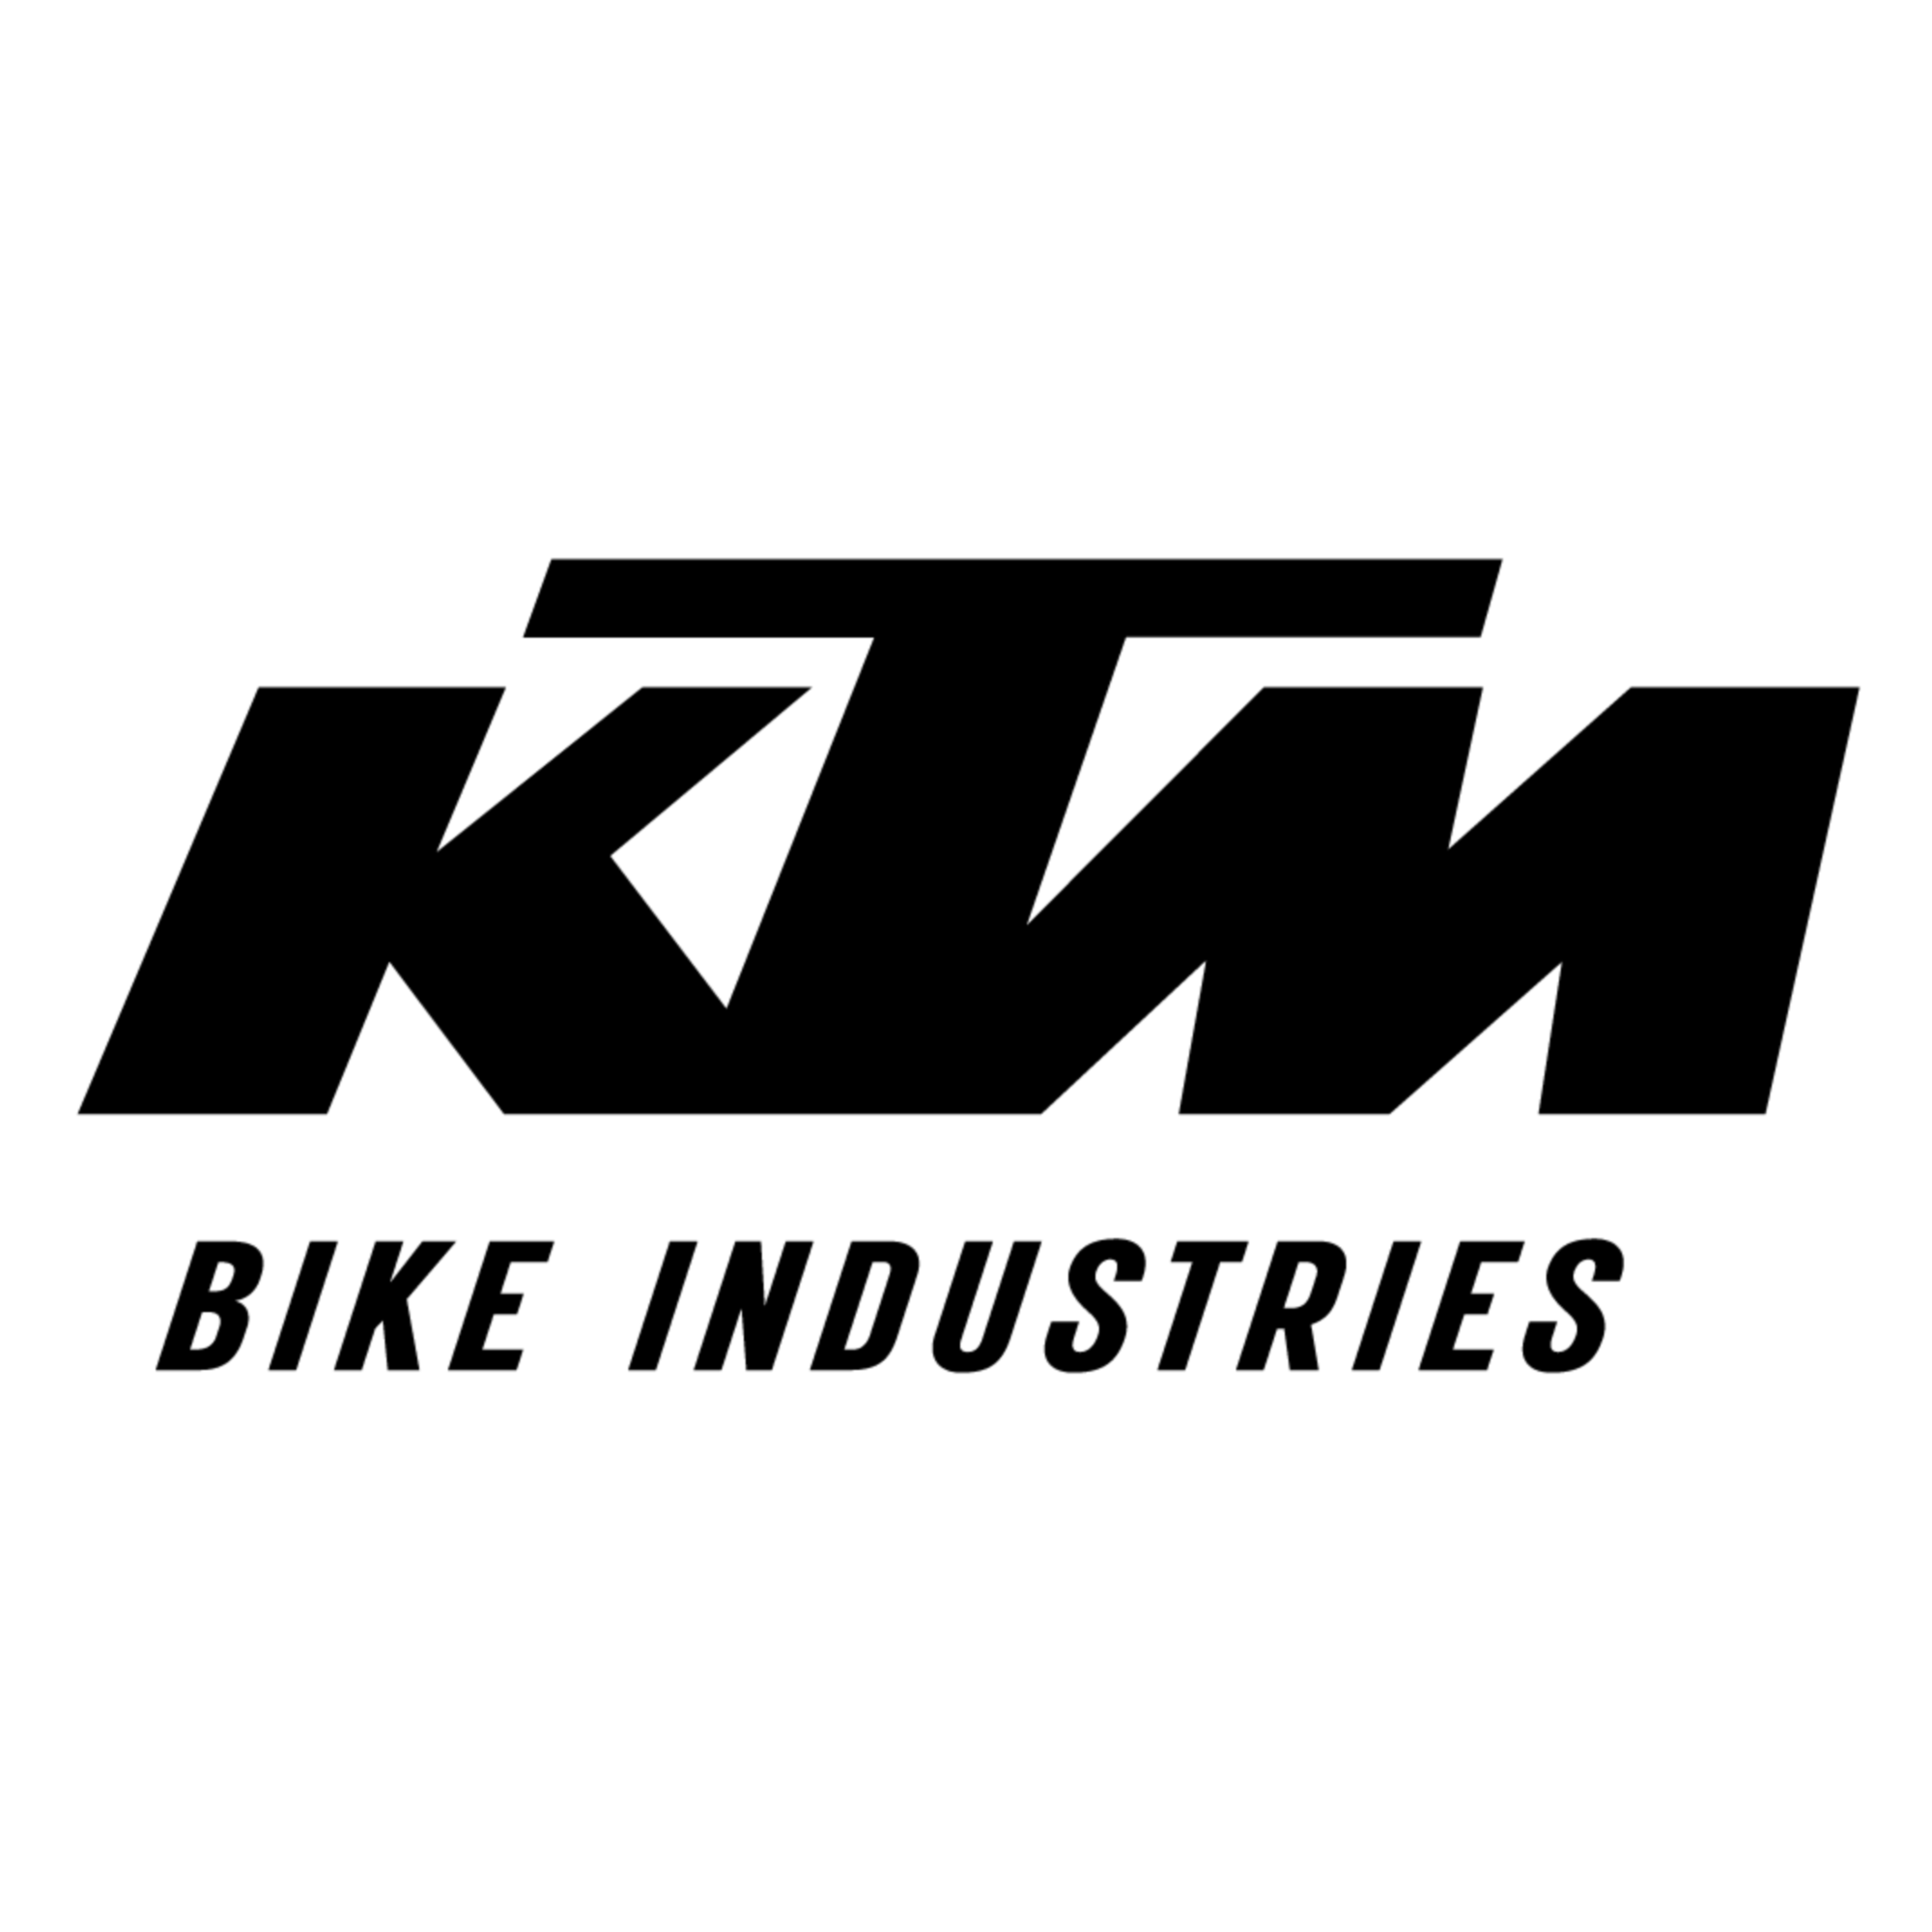 KTM BIKE INDUSTRIES